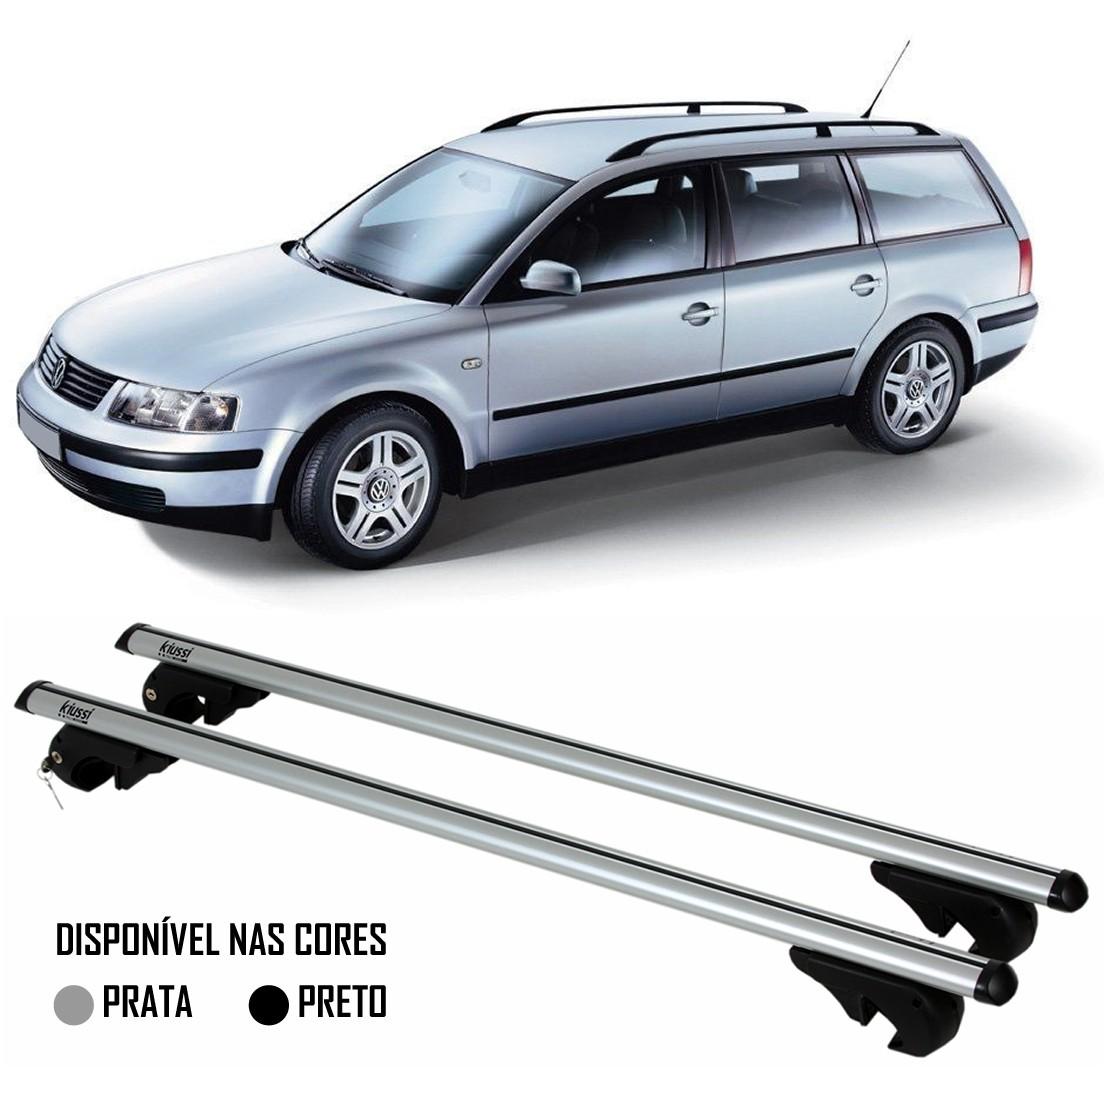 Rack Travessa Vw Passat Variant 1999 2001 2002 2003 2004 2005 - Kiussi Belluno 117cm Alumínio Com Chave 50KG - Preto / Prata